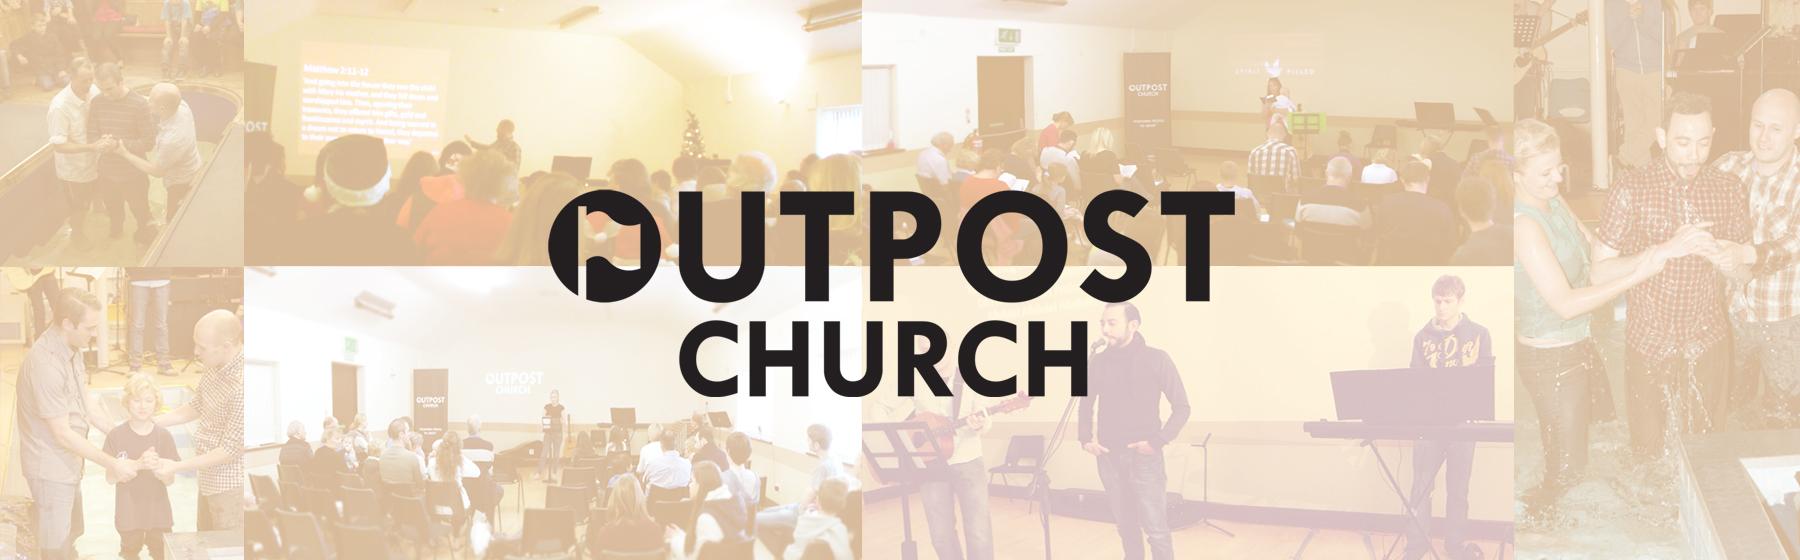 church-banner2015